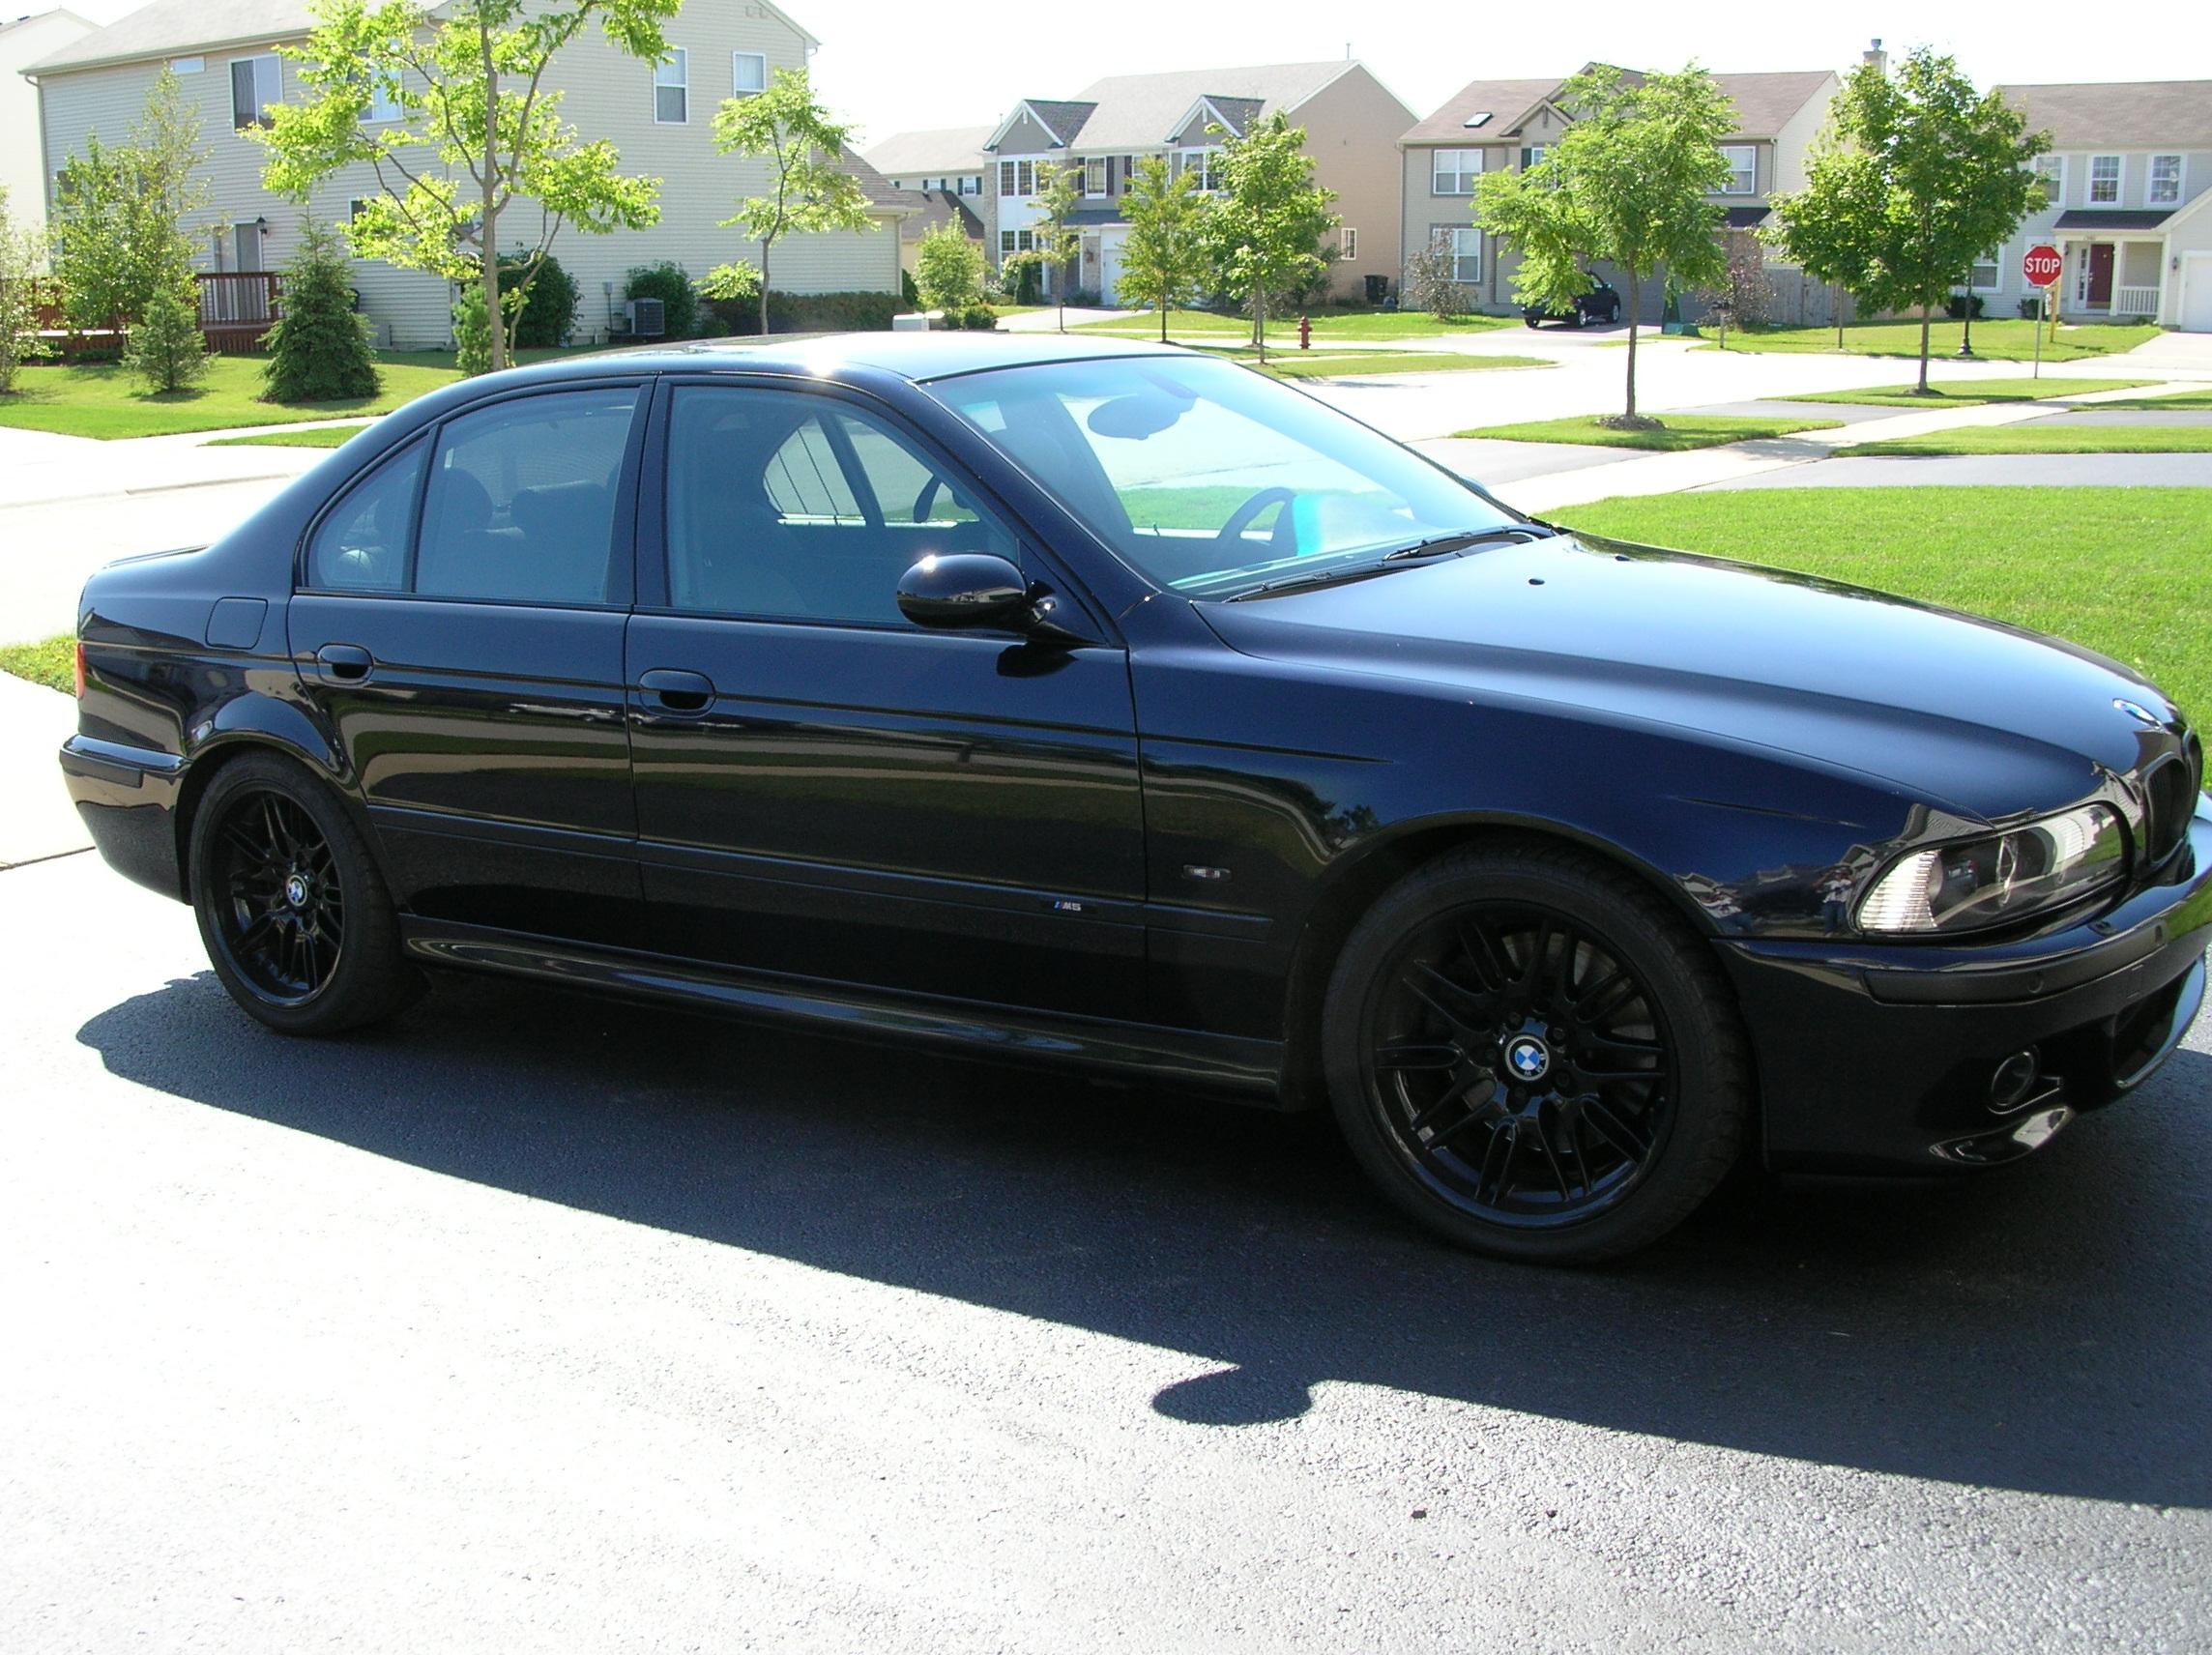 E39 9603 For Sale Powder Coated Black M5 Rims for sale  BMW M5